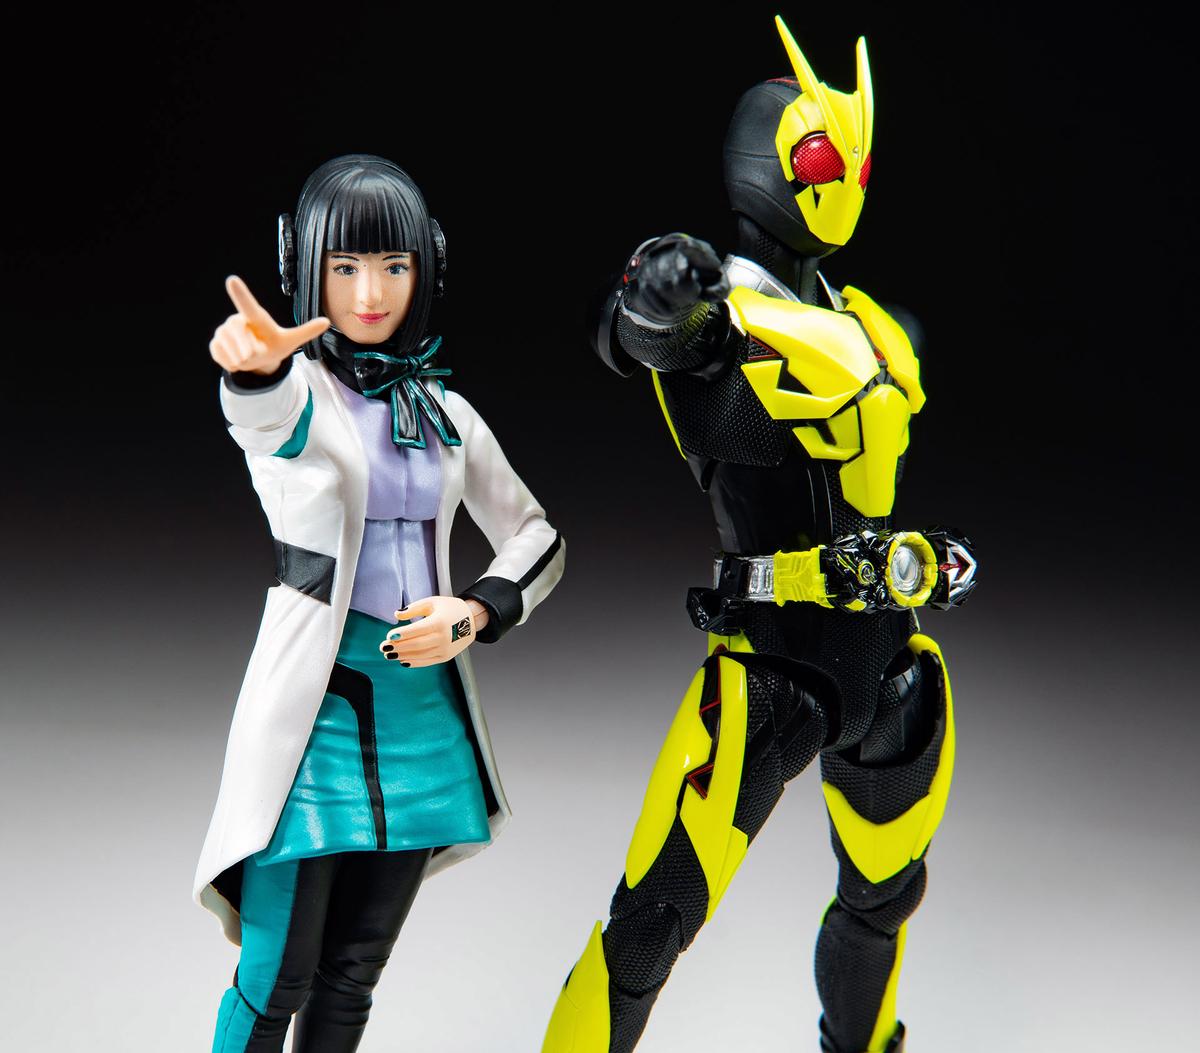 f:id:hiroban-ch:20210206200754j:plain